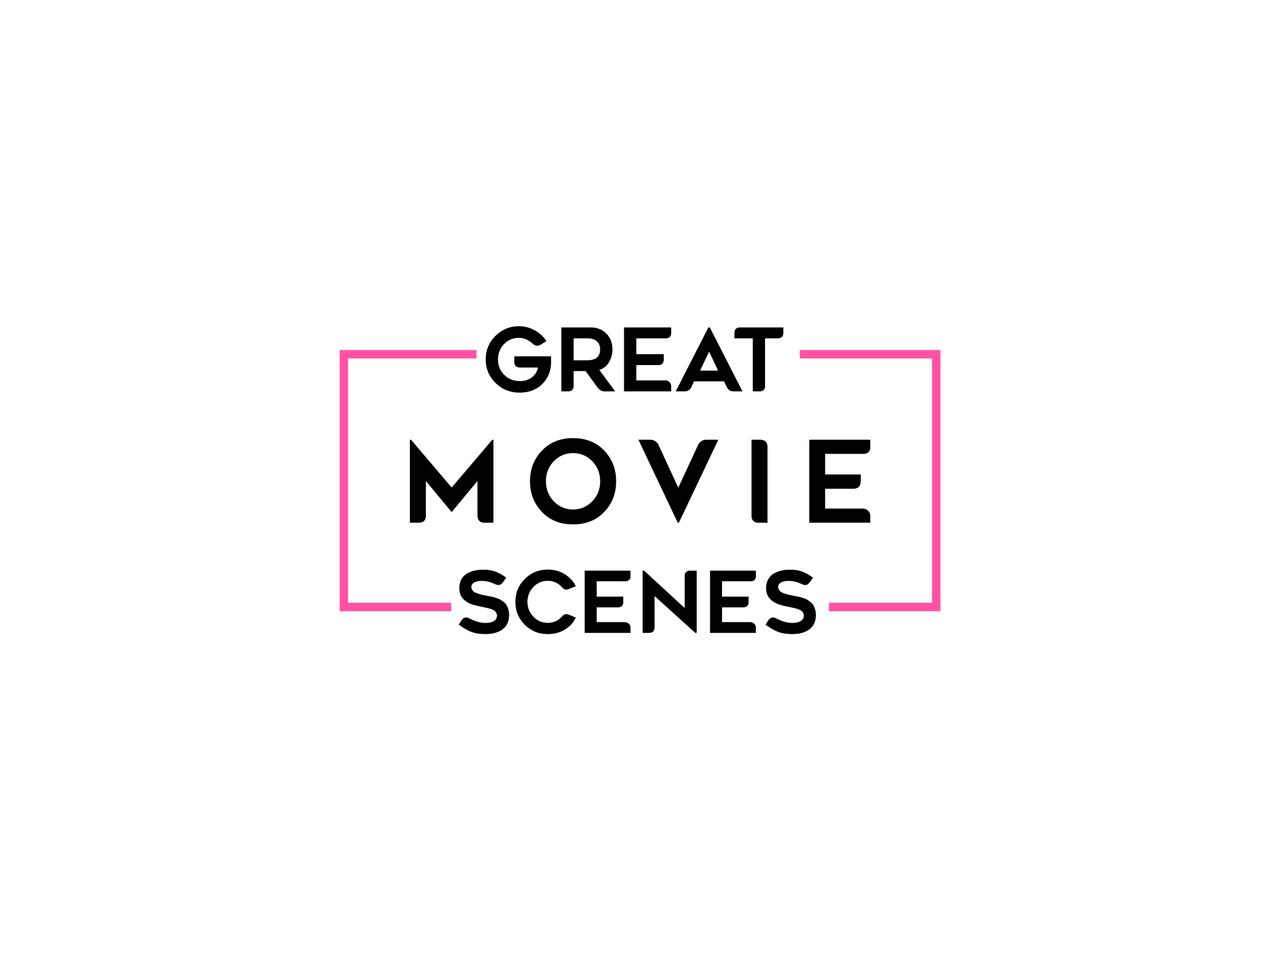 Great Movie Scenes